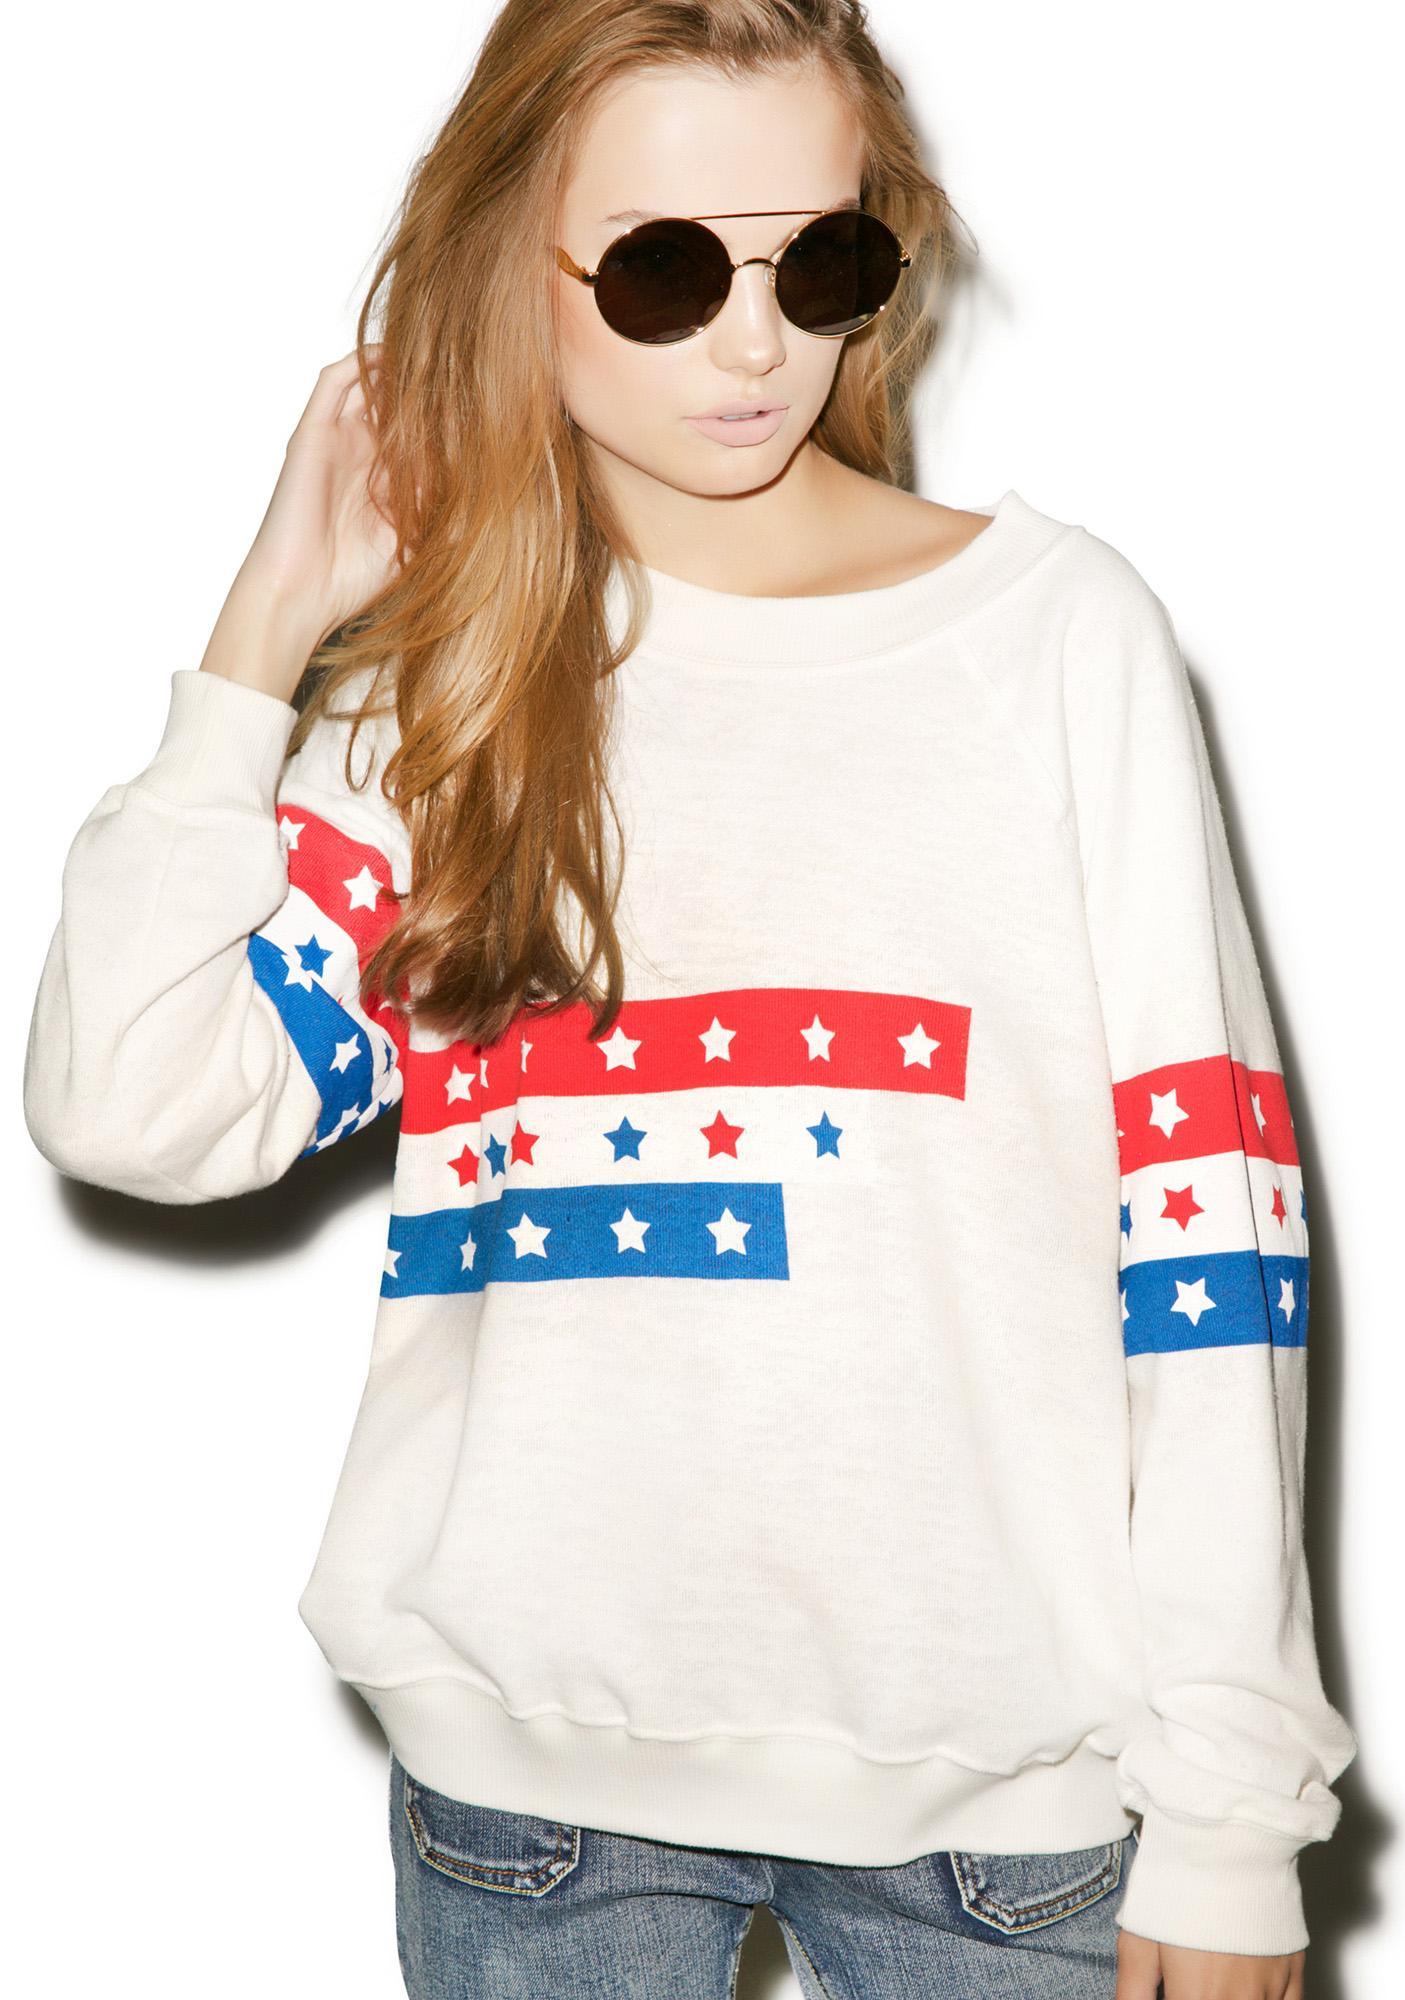 Wildfox Couture U.S. Racer Kim's Sweater